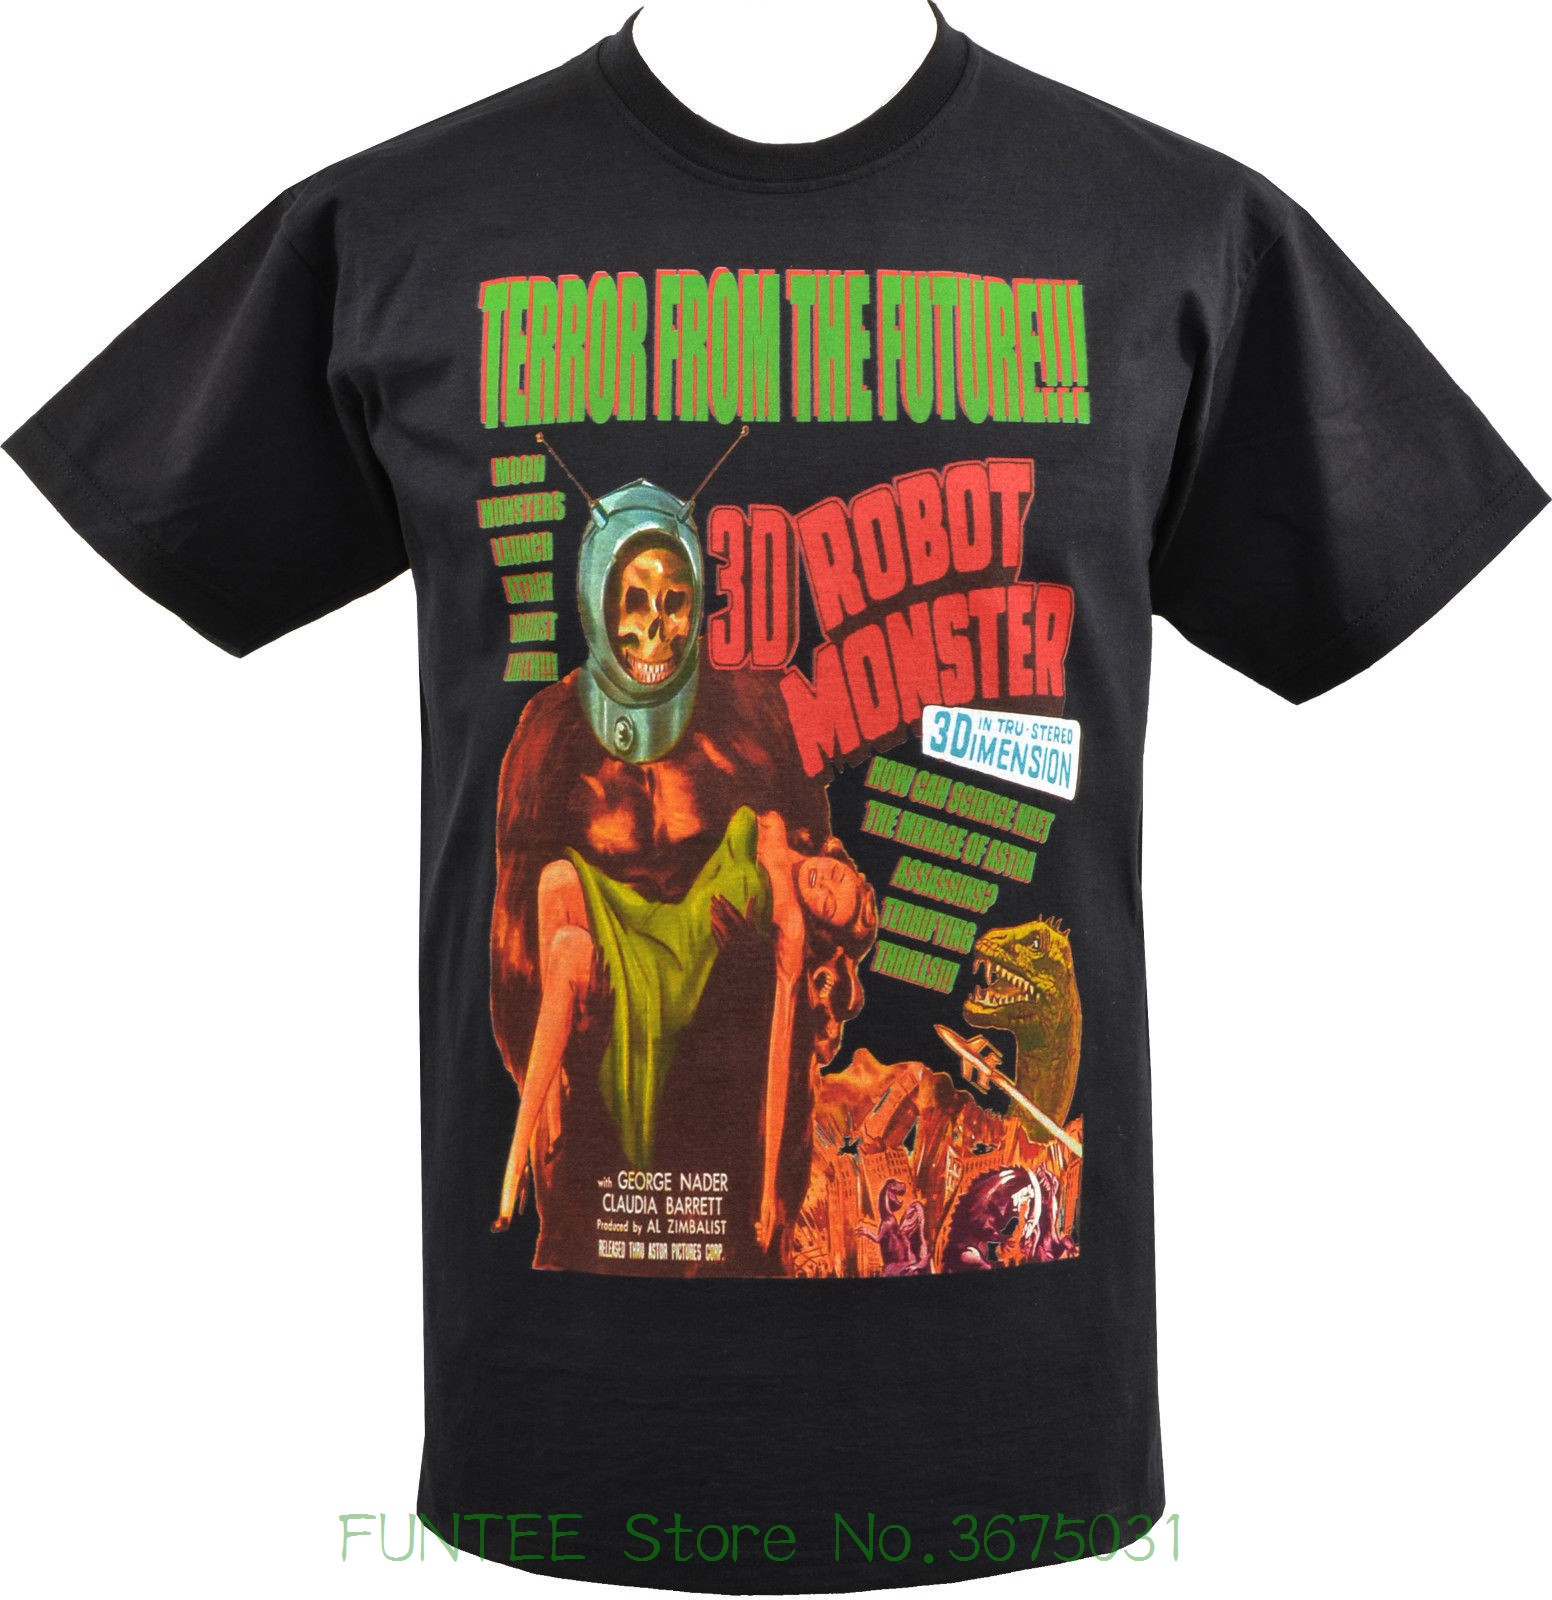 Casual Fitness hombres camisetas hombres negro camiseta Terror del futuro Robot monstruo B-Movie Sci-Fi S-5xl